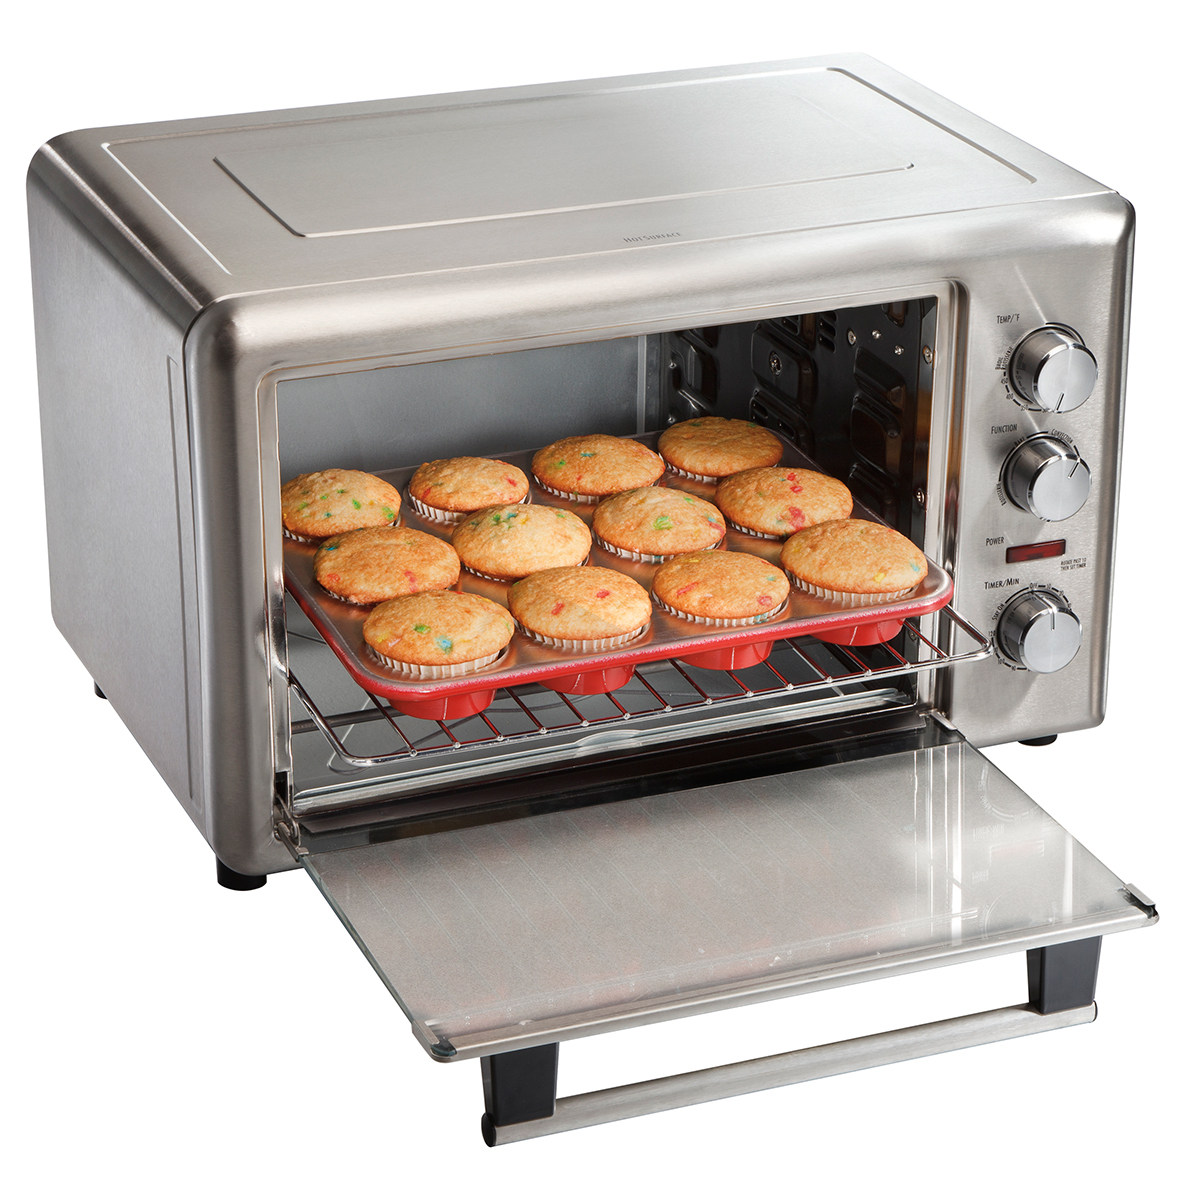 countertop oven 31103 stainless hamiltonbeach com